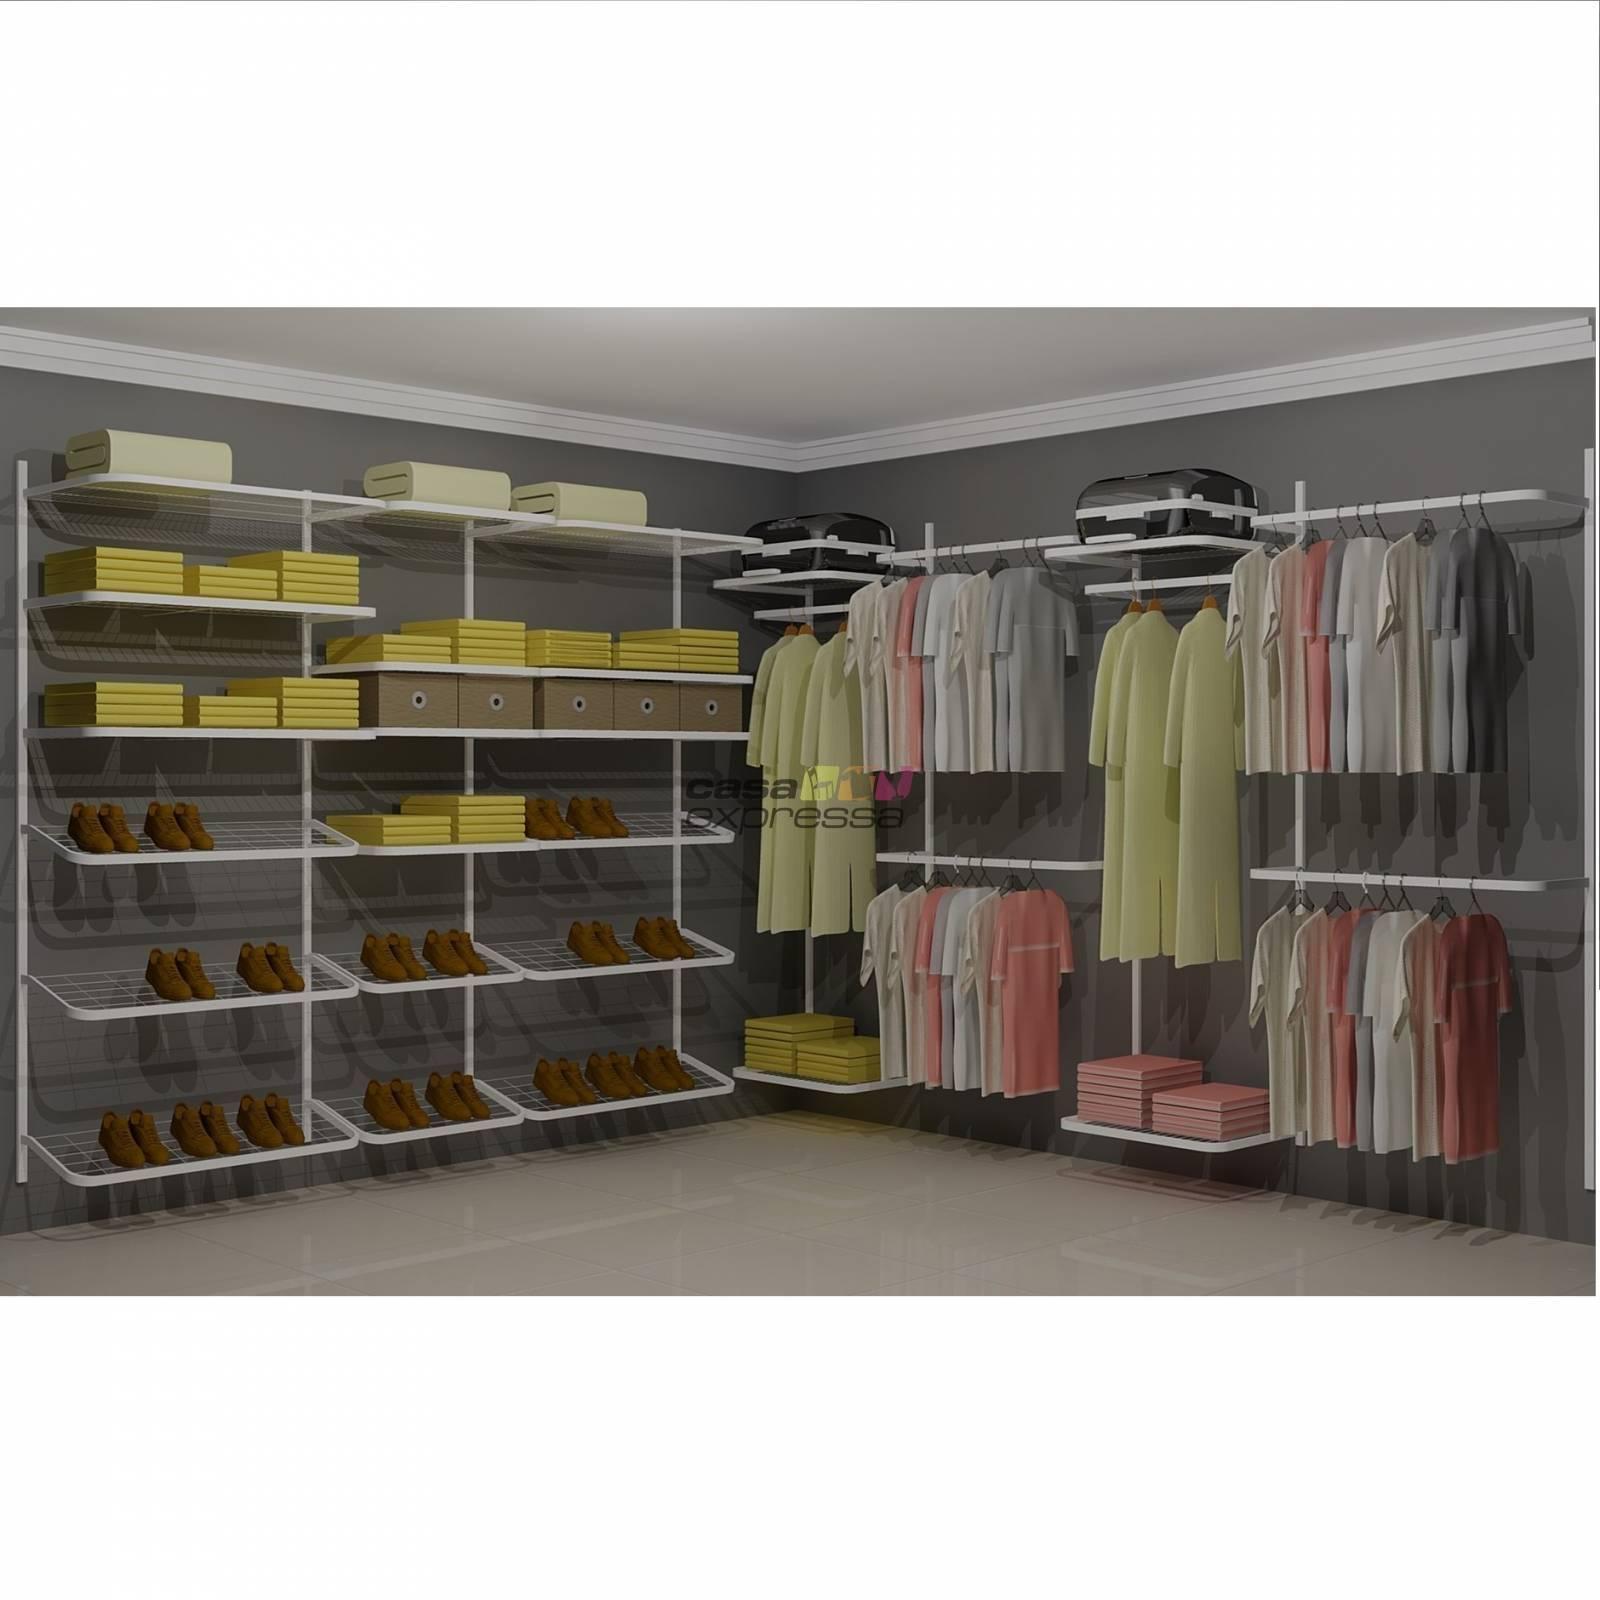 Closet Aramado em L  CLN07 - 3,10 x 3,10m - CASA EXPRESSA